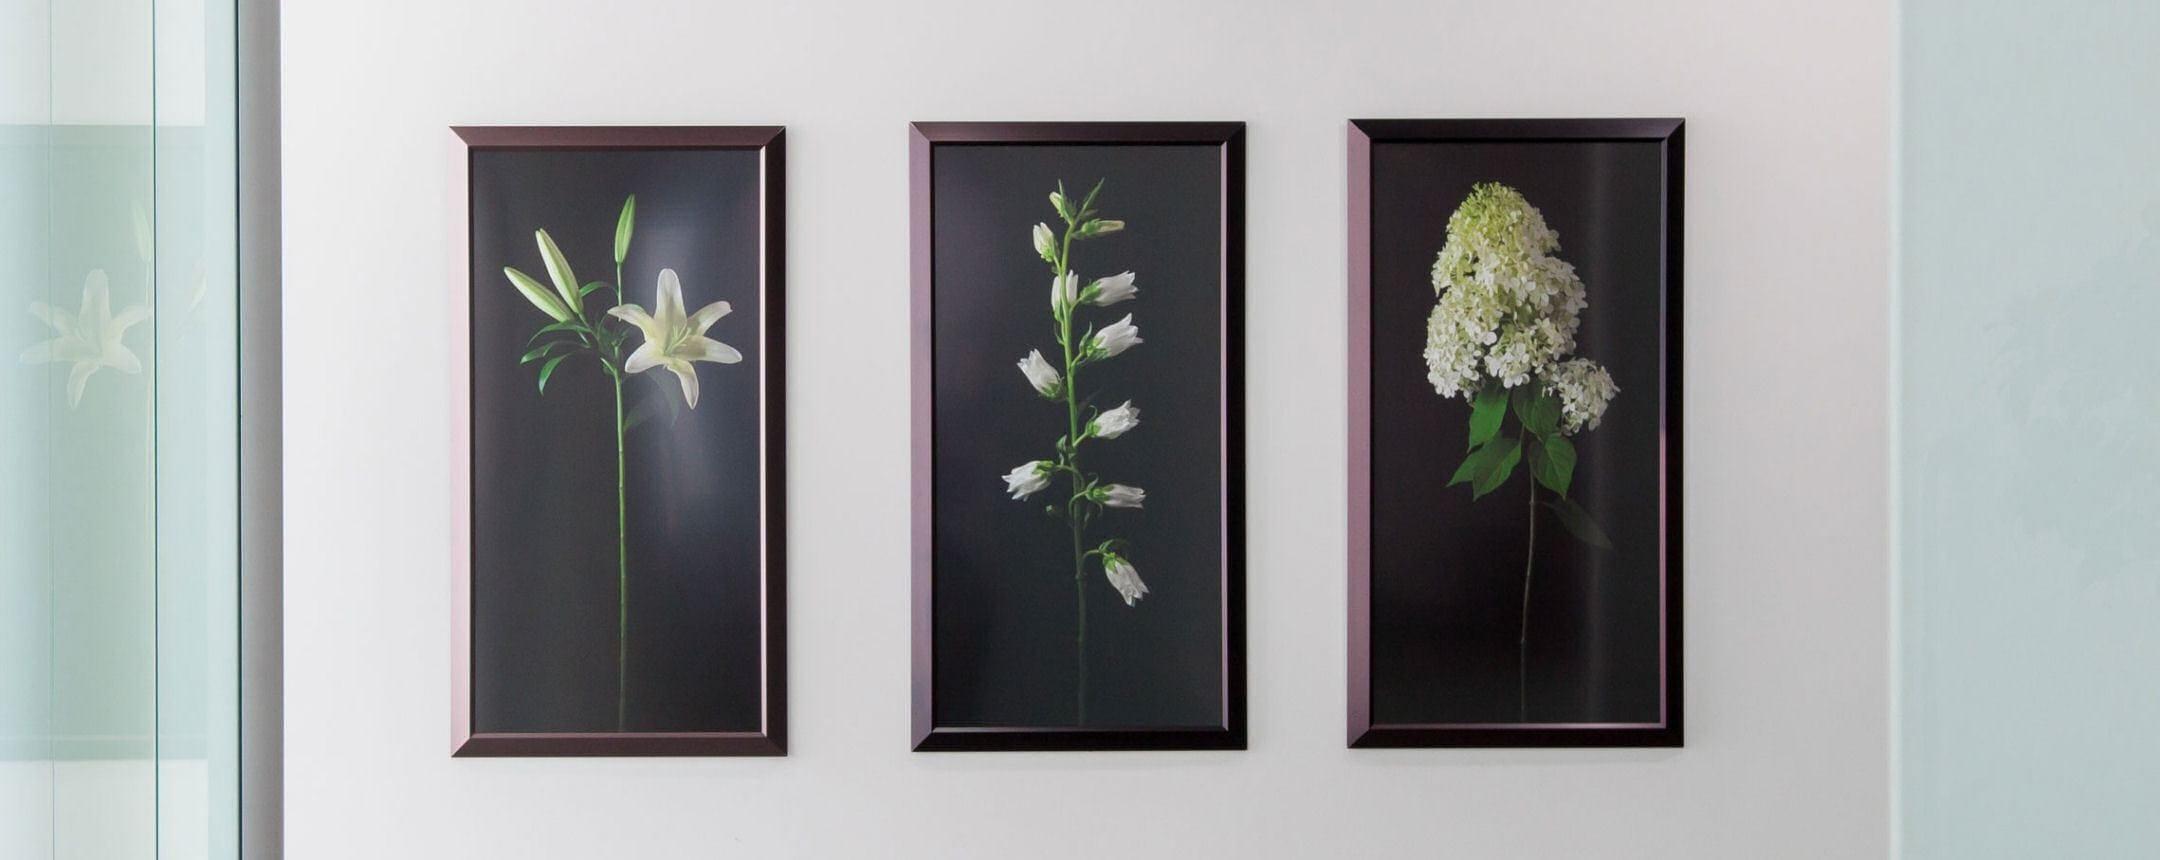 Arlington VA Dentist Office flower pictures